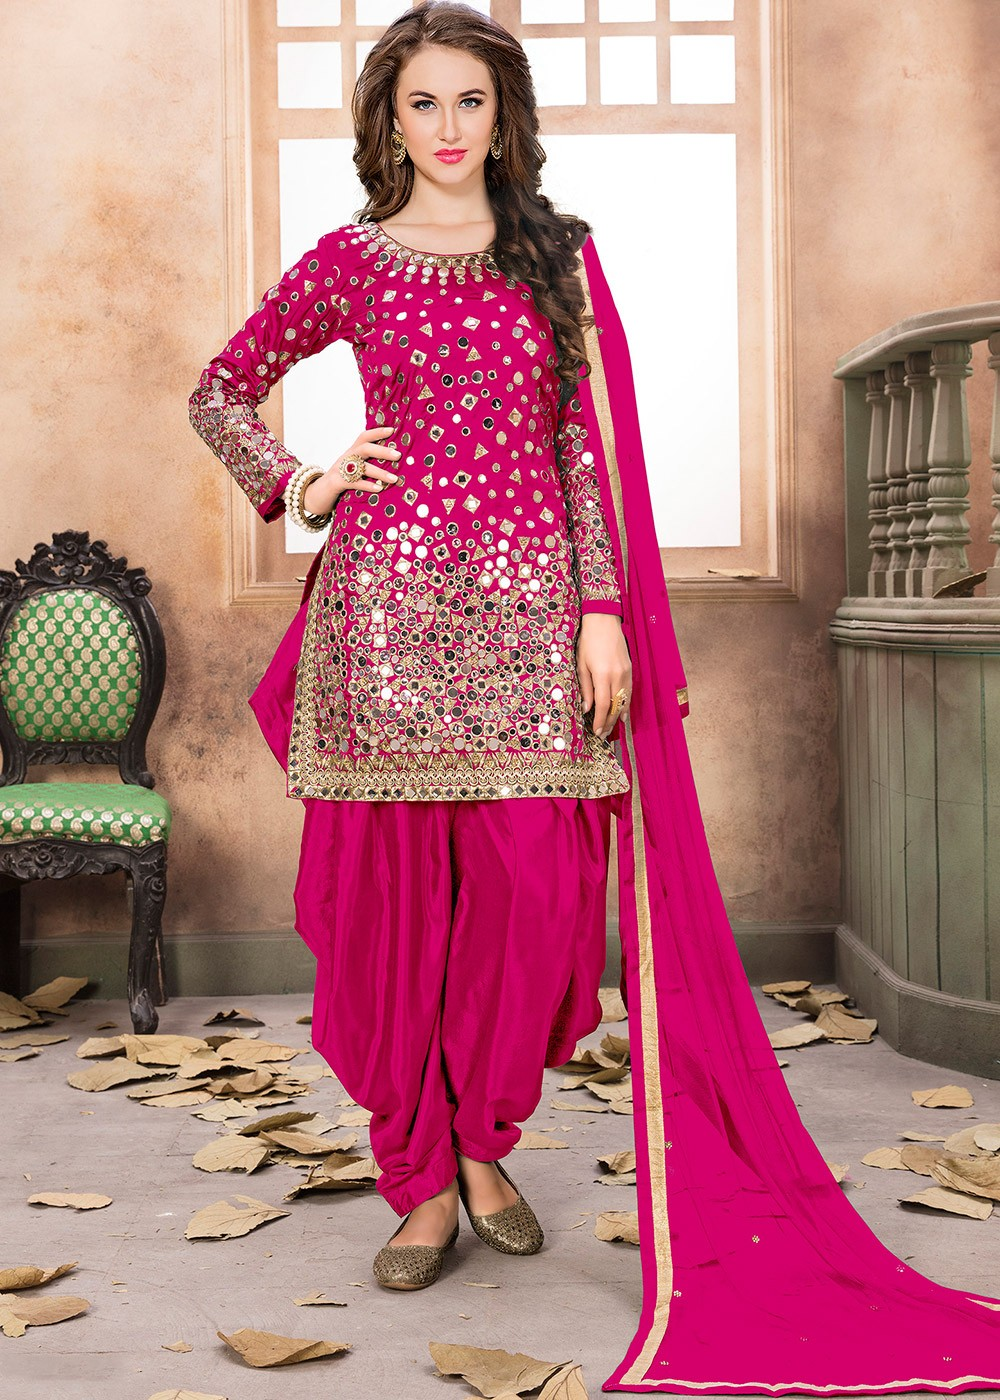 Pink Art Silk Punjabi Salwar Suit With Dupatta Most Loved Styles 1931sl02